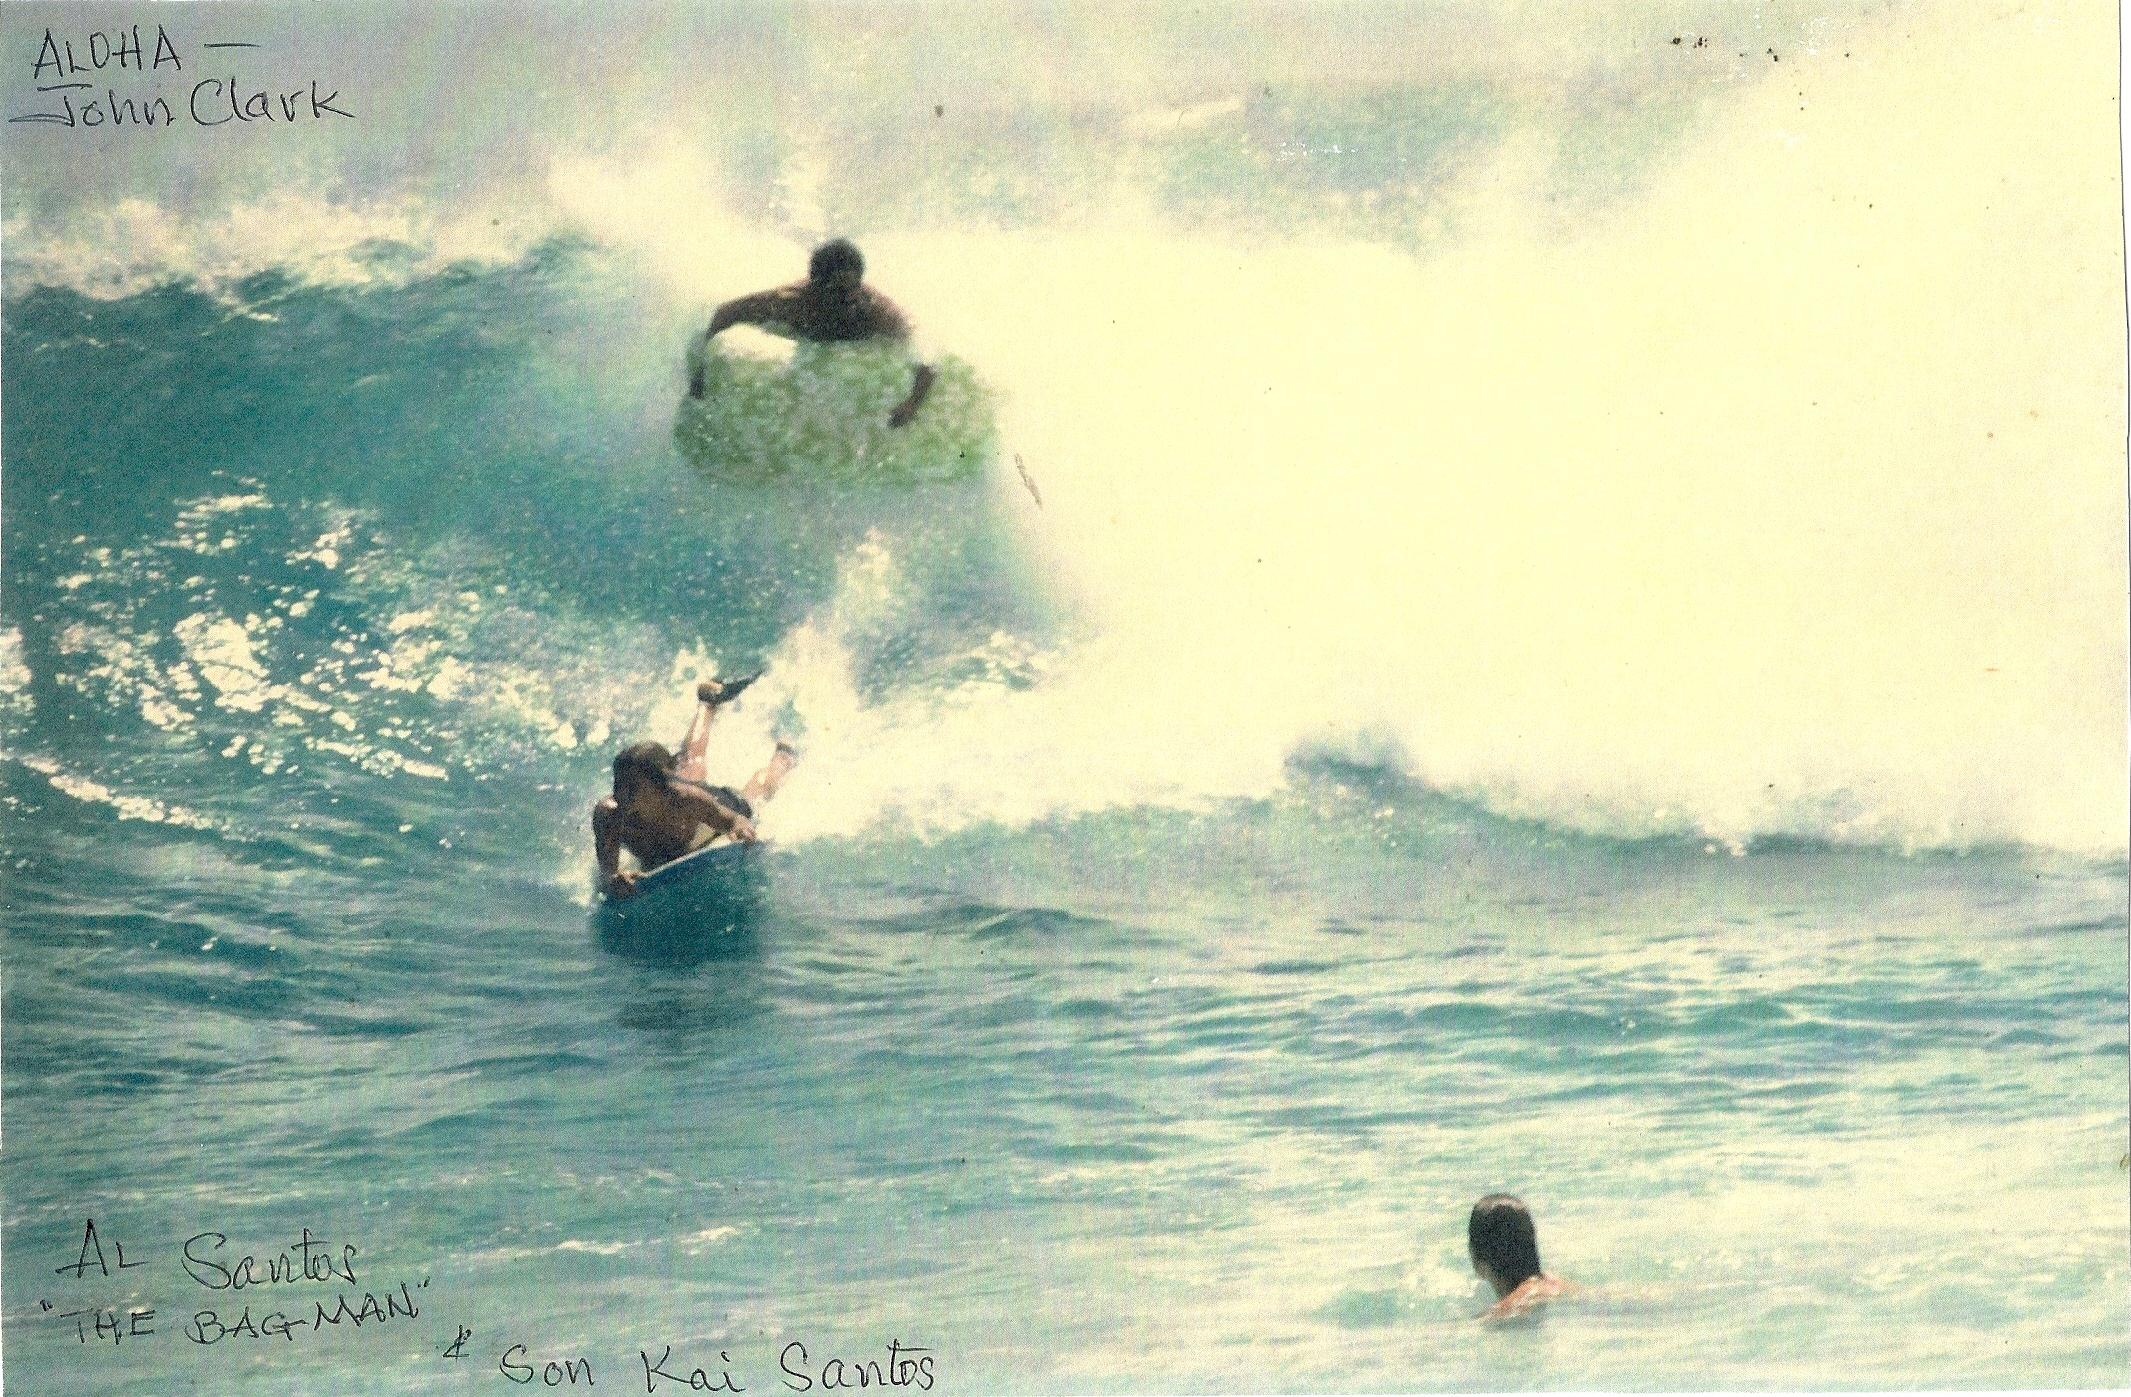 Al Santos surfing with his son Kai Santos on the bodyboard. Sandy Beach, Oahu. 1968